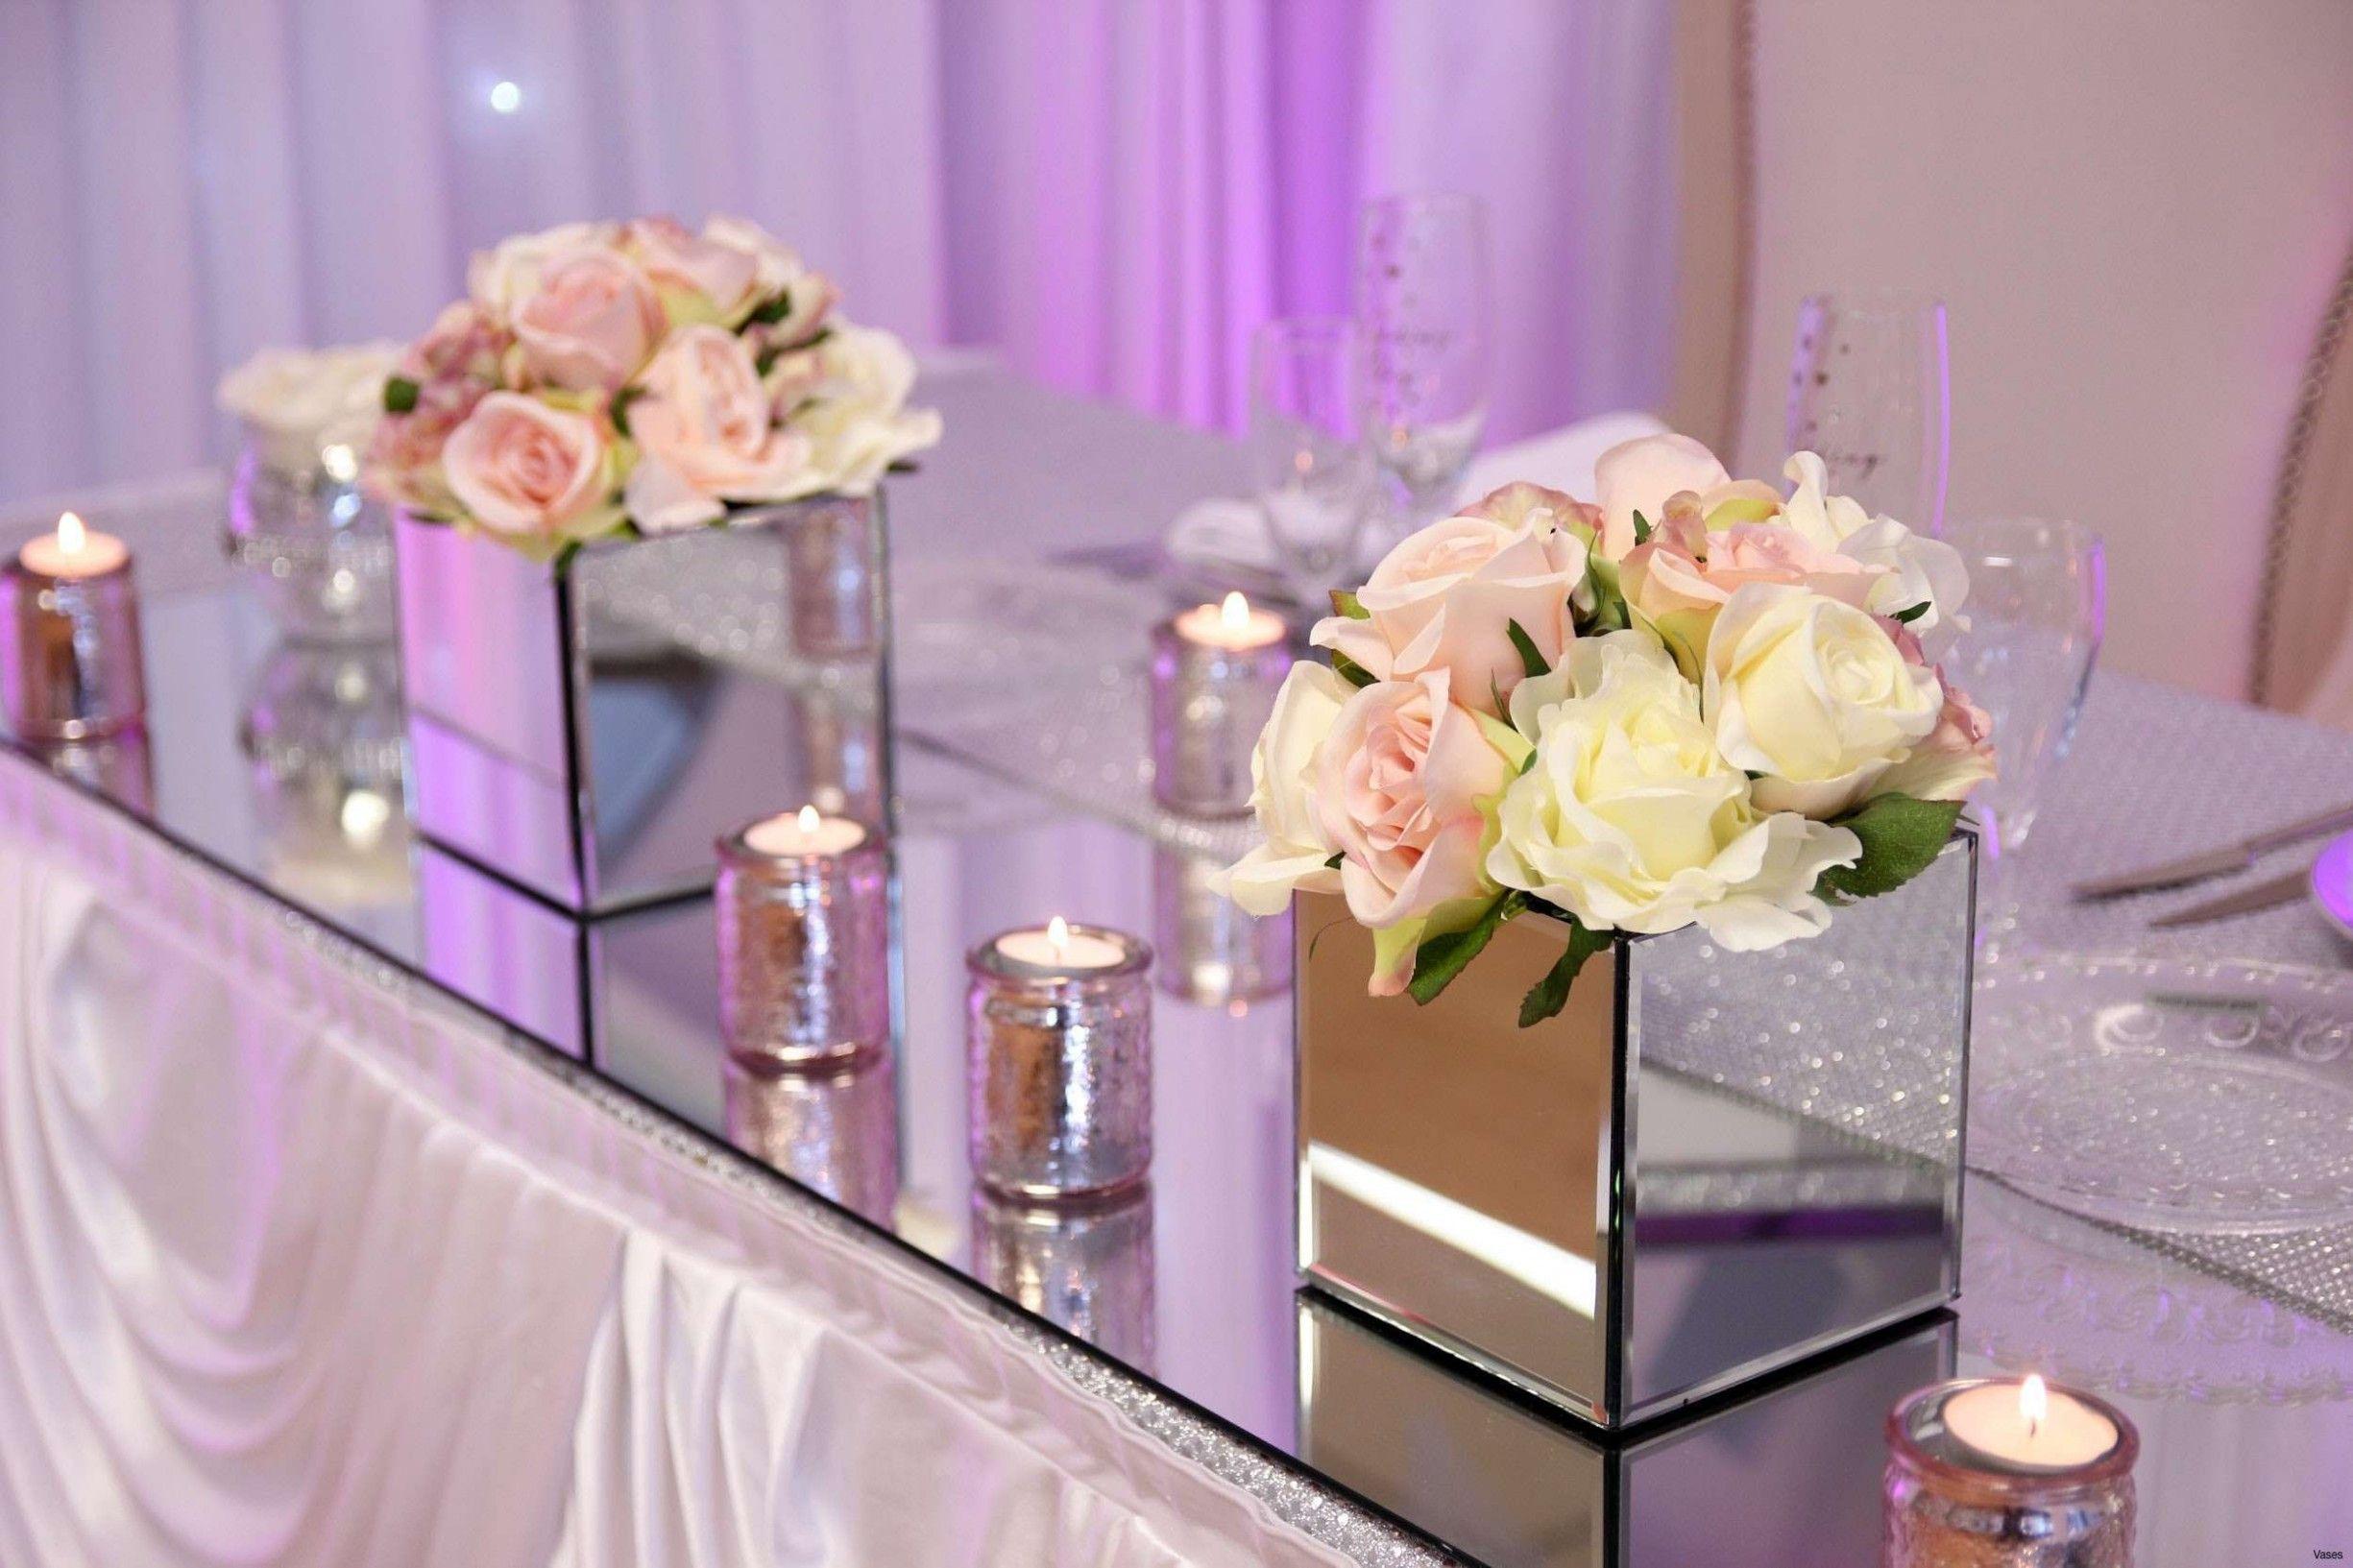 decorative flower vase of flower vase ideas elegant mirrored square vase 3h vases mirror table inside flower vase ideas elegant mirrored square vase 3h vases mirror table decorationi 0d weddings